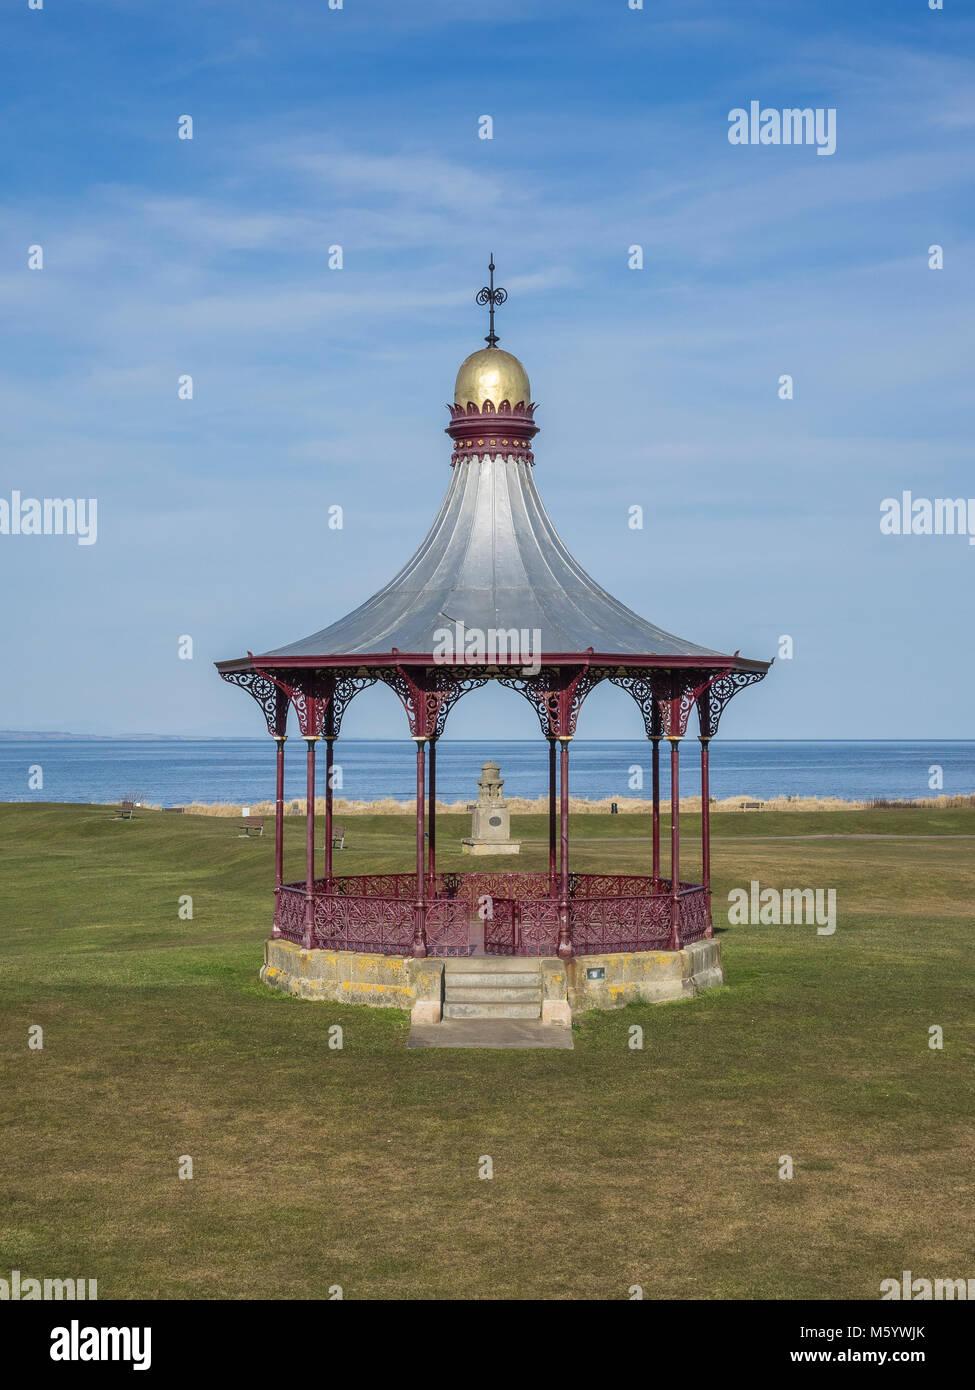 The Wallace Bandstand, Marine Road, Nairn, Highland Region, Scotland, UK - Stock Image